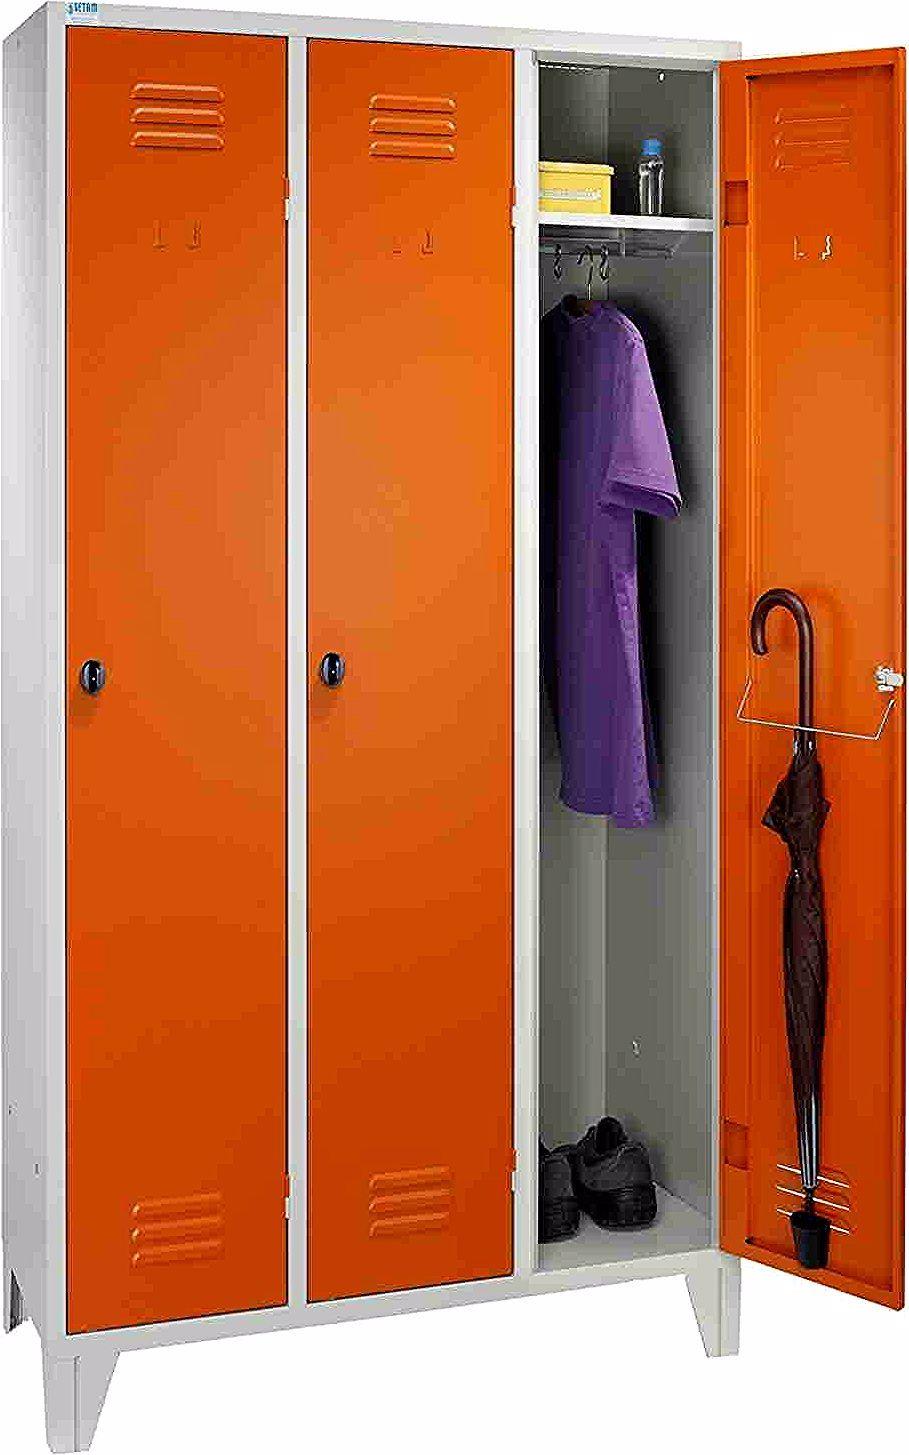 Meuble Metallique Conforama Nice Casier Vestiaire Pas Cher Great Vestiaire With Casier In 2020 Locker Storage Storage Knit Mini Dress